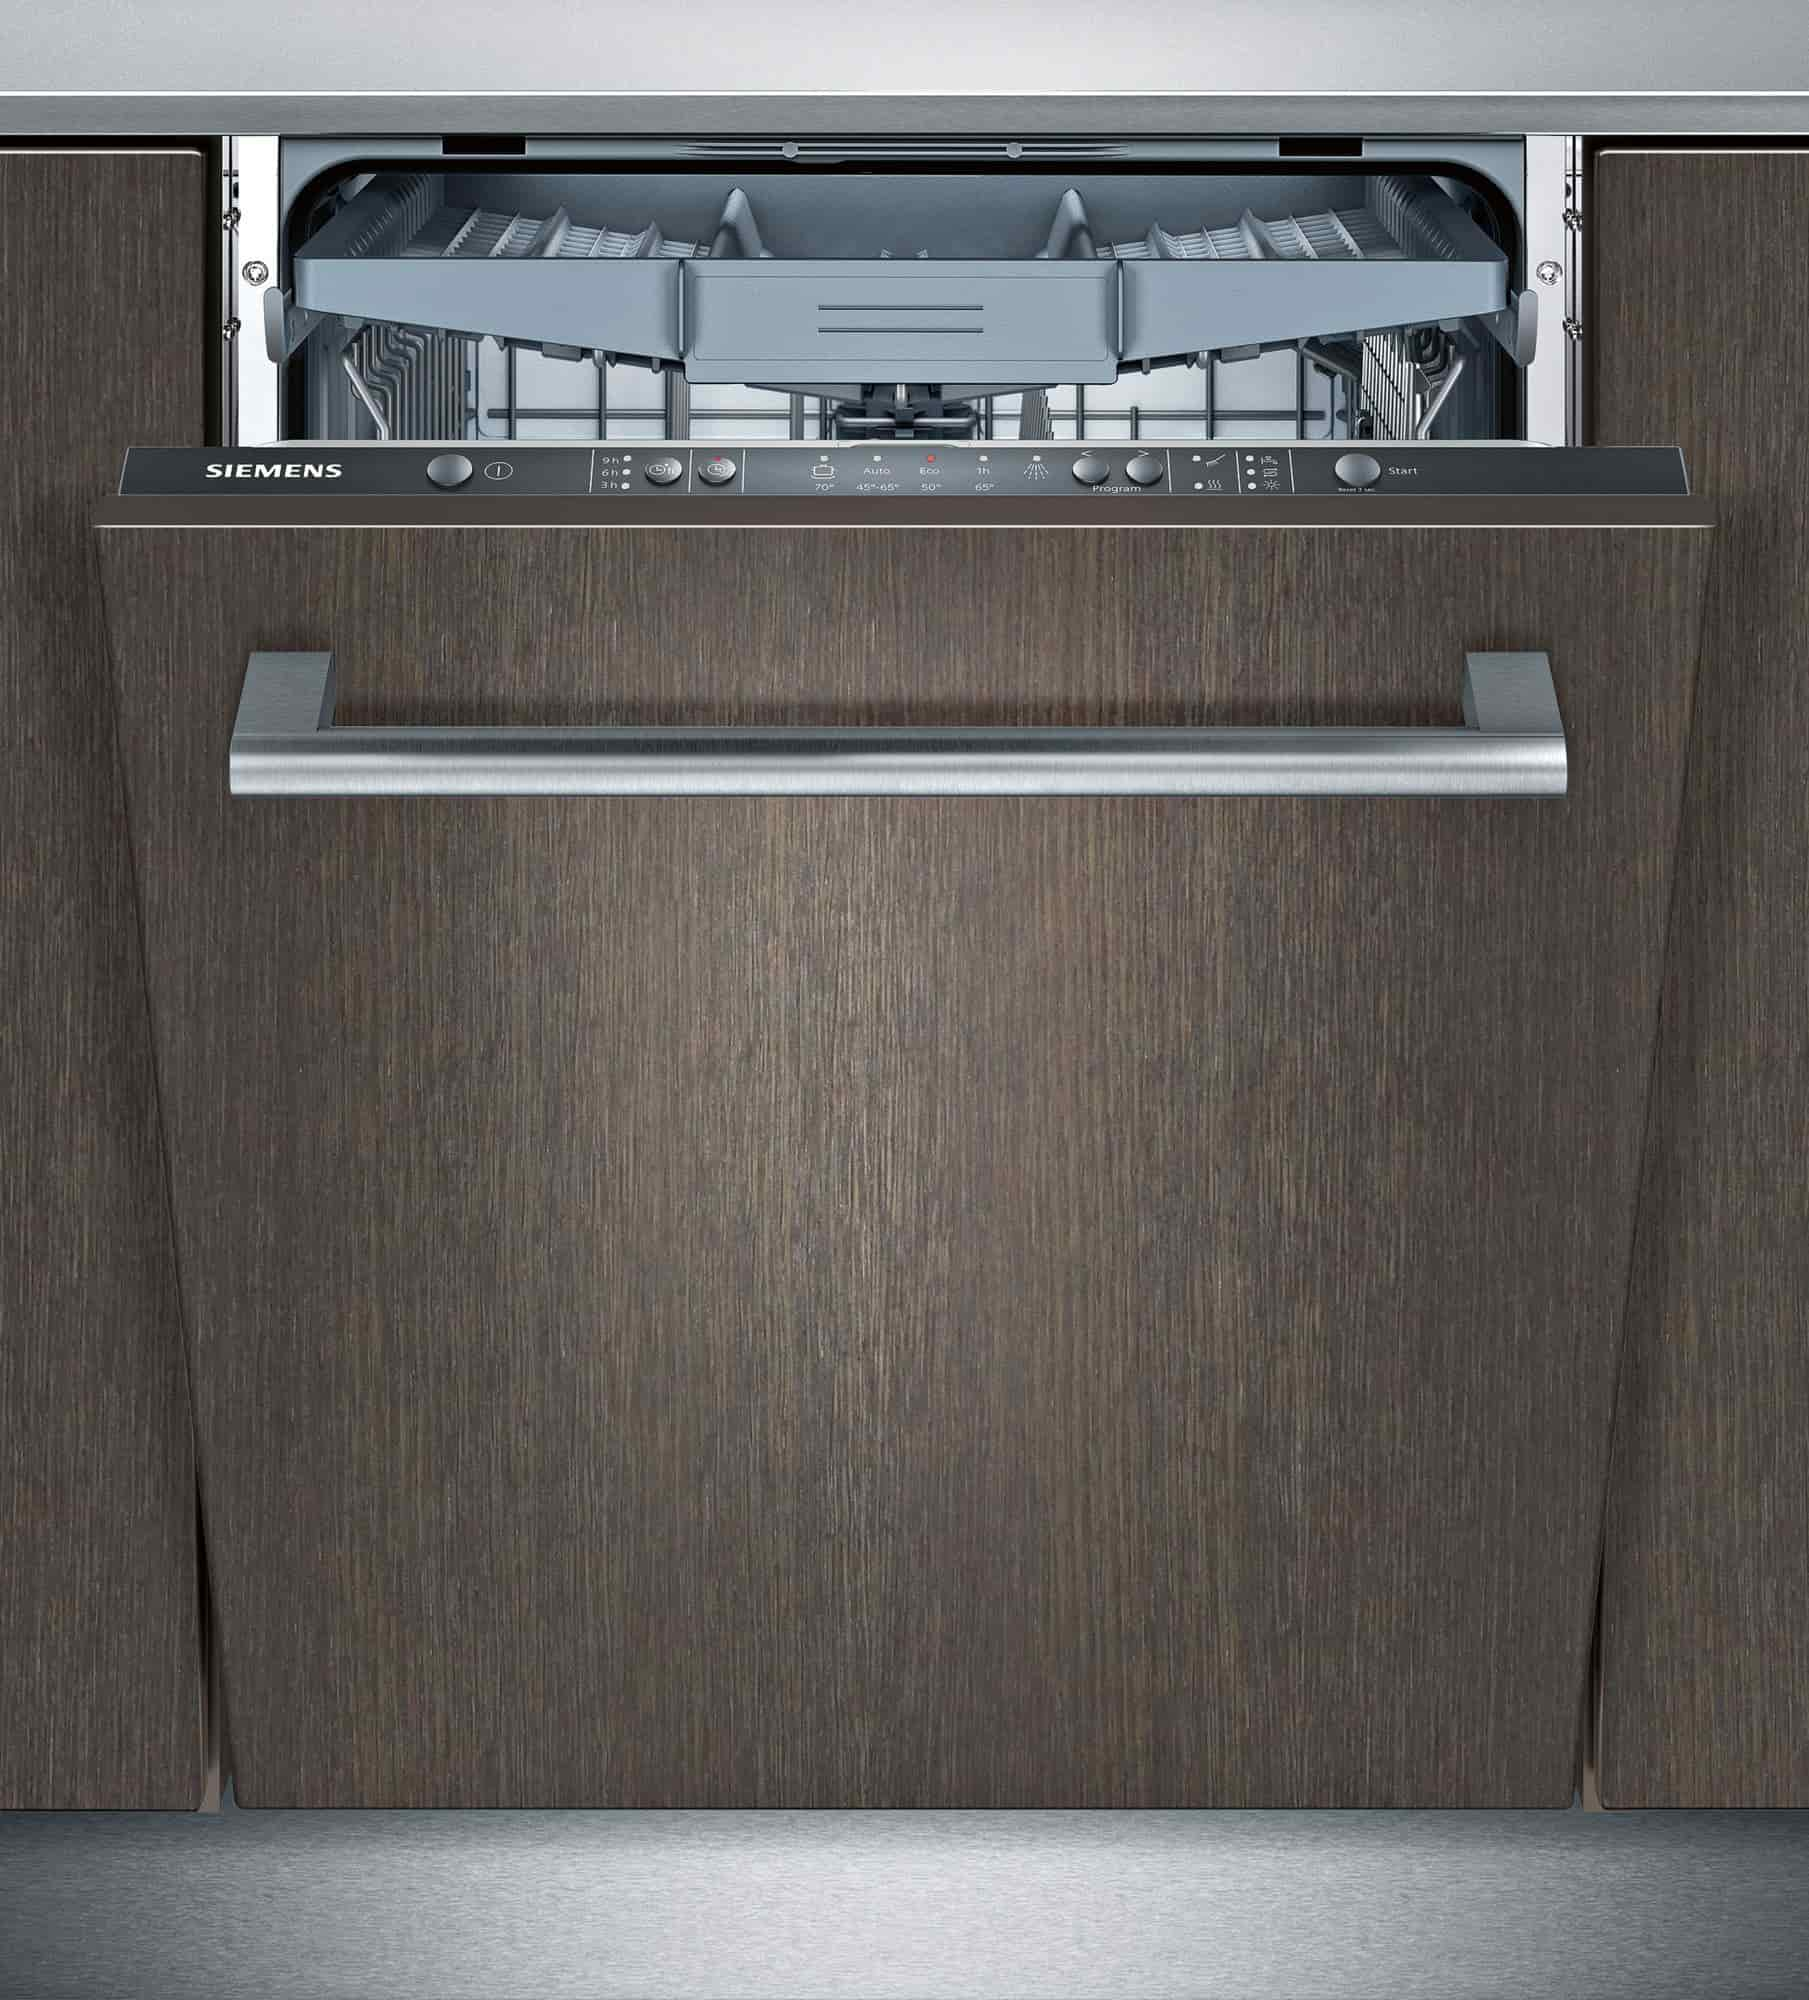 Buy Siemens iQ100 Built In Dishwasher Black [SN615X00EE], Features ...